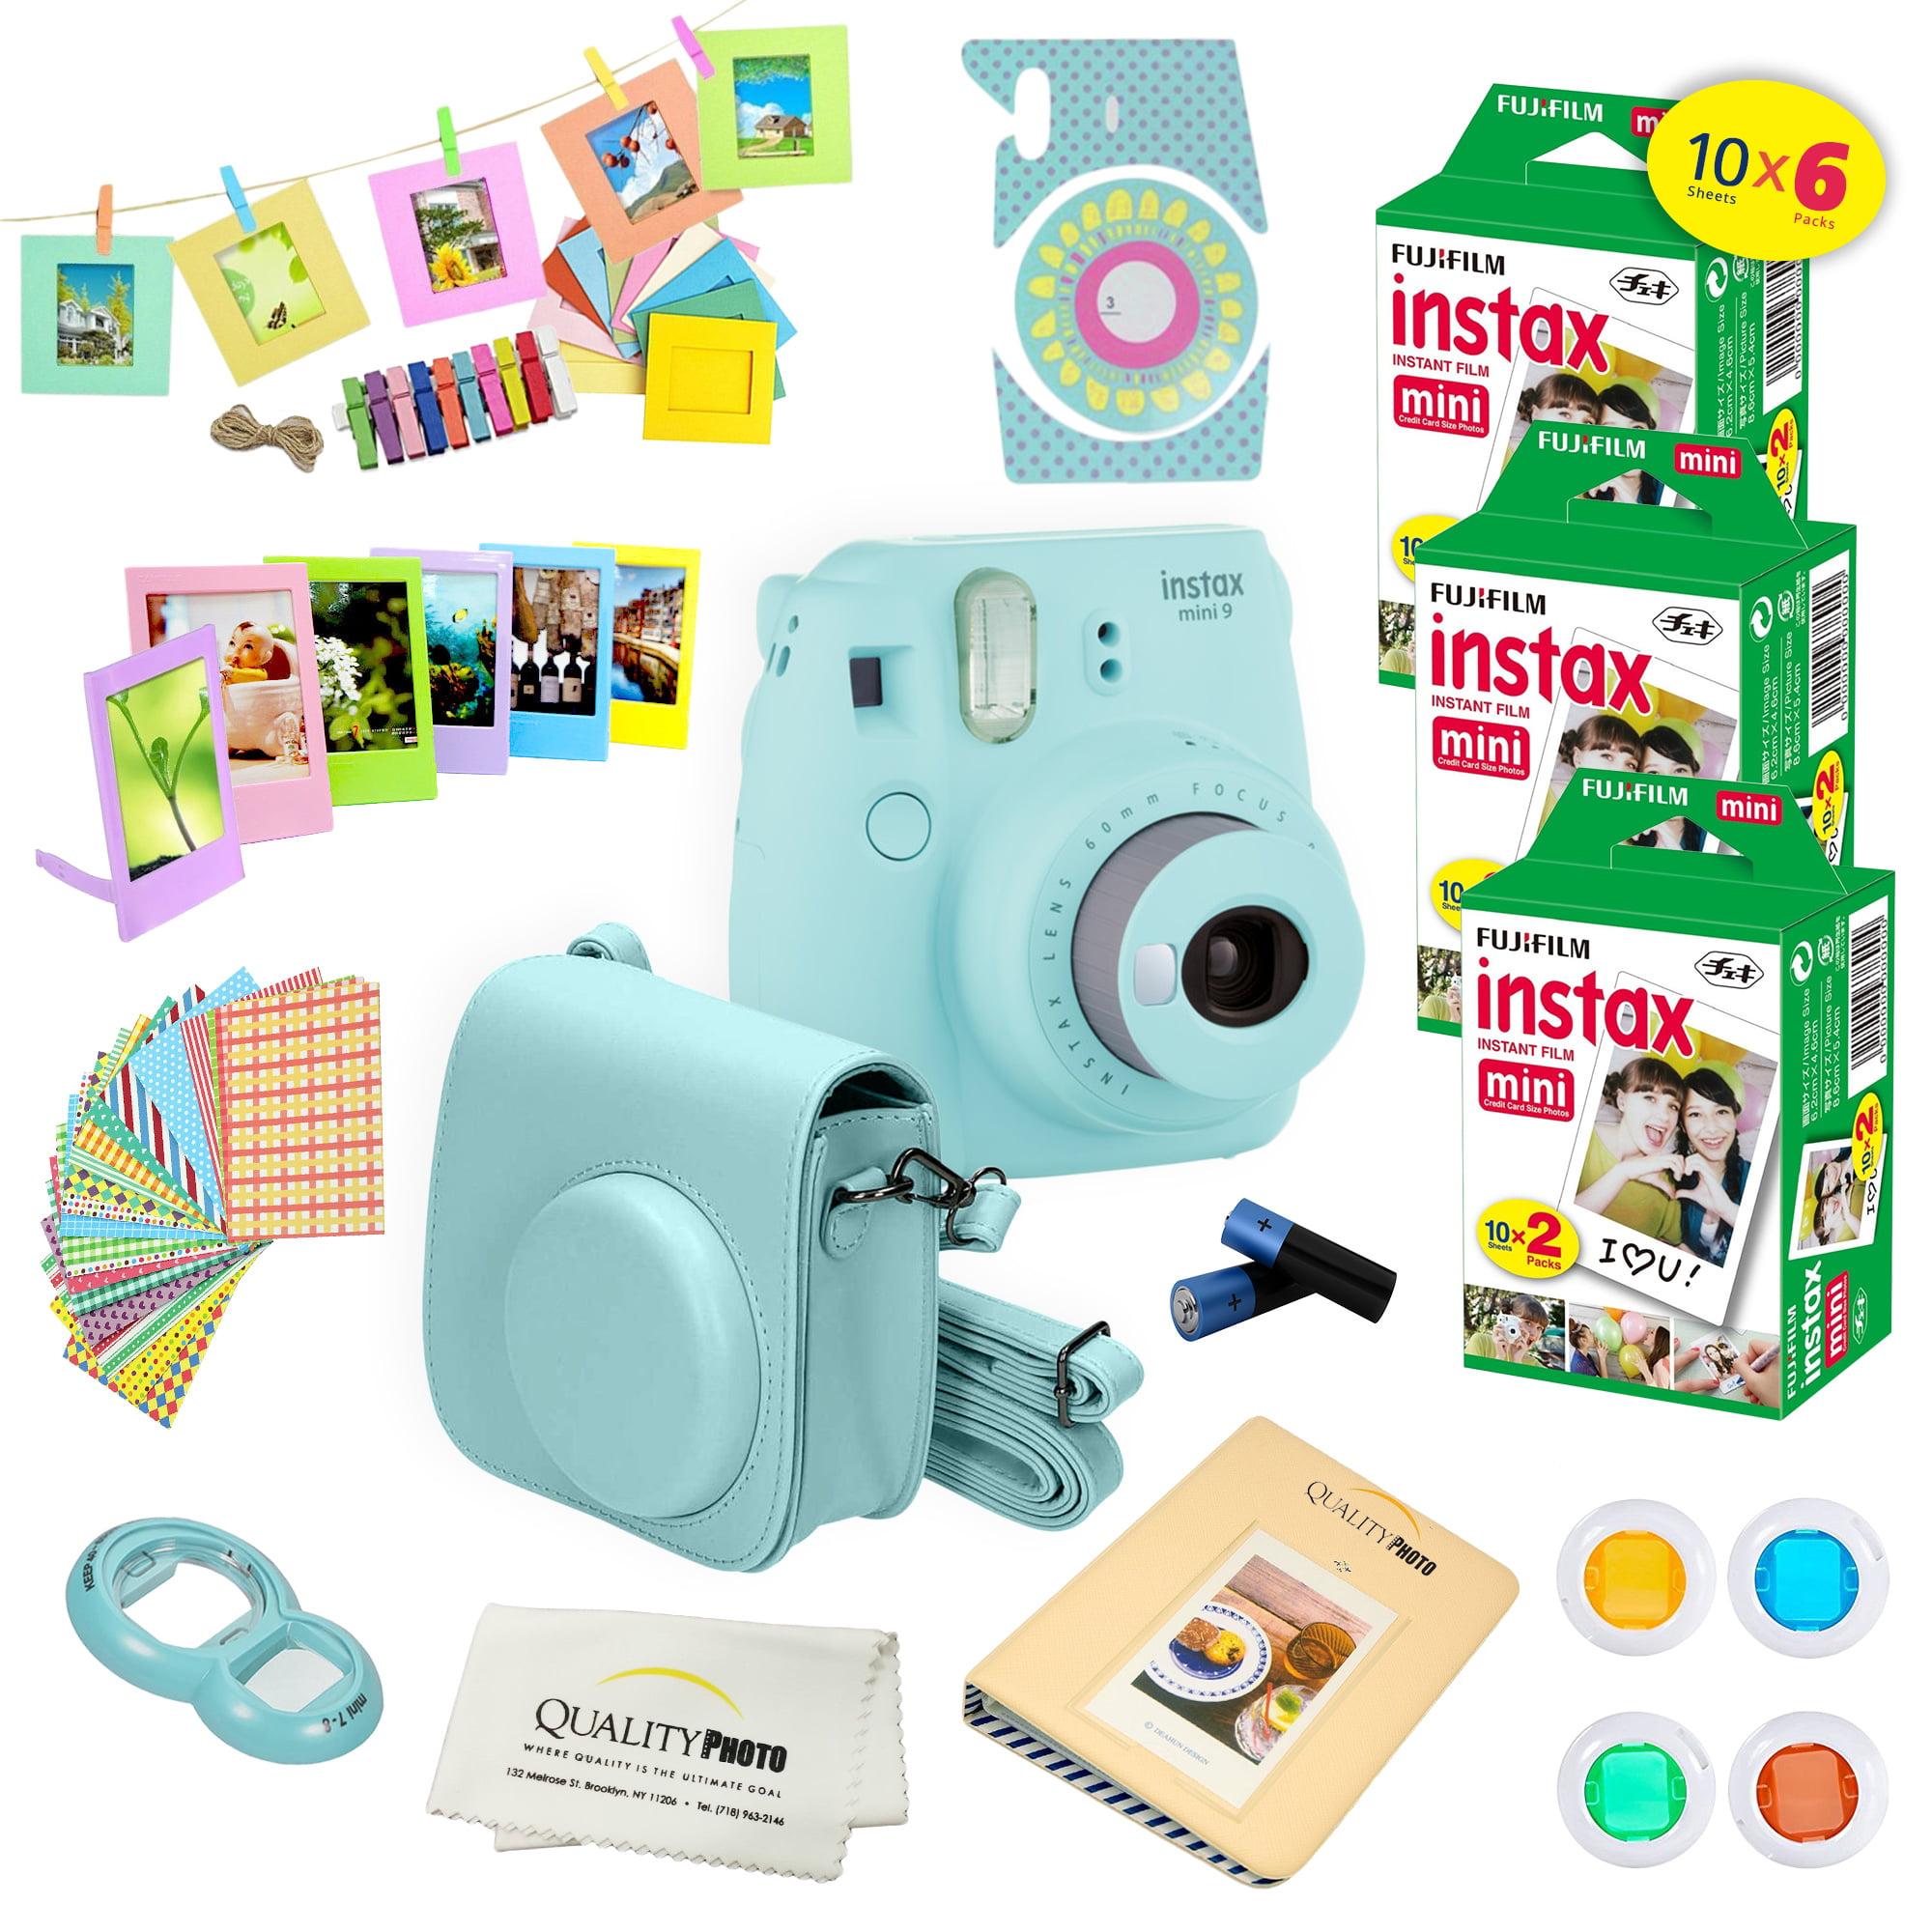 Fujifilm Instax Mini 9 Camera Blue + 15 PC Accessory Kit for Fujifilm instax mini 9 Instant Camera Includes: 60 Fuji Instax Films + Case + Album + Colored lenses + Assorted color/Style frames + MORE